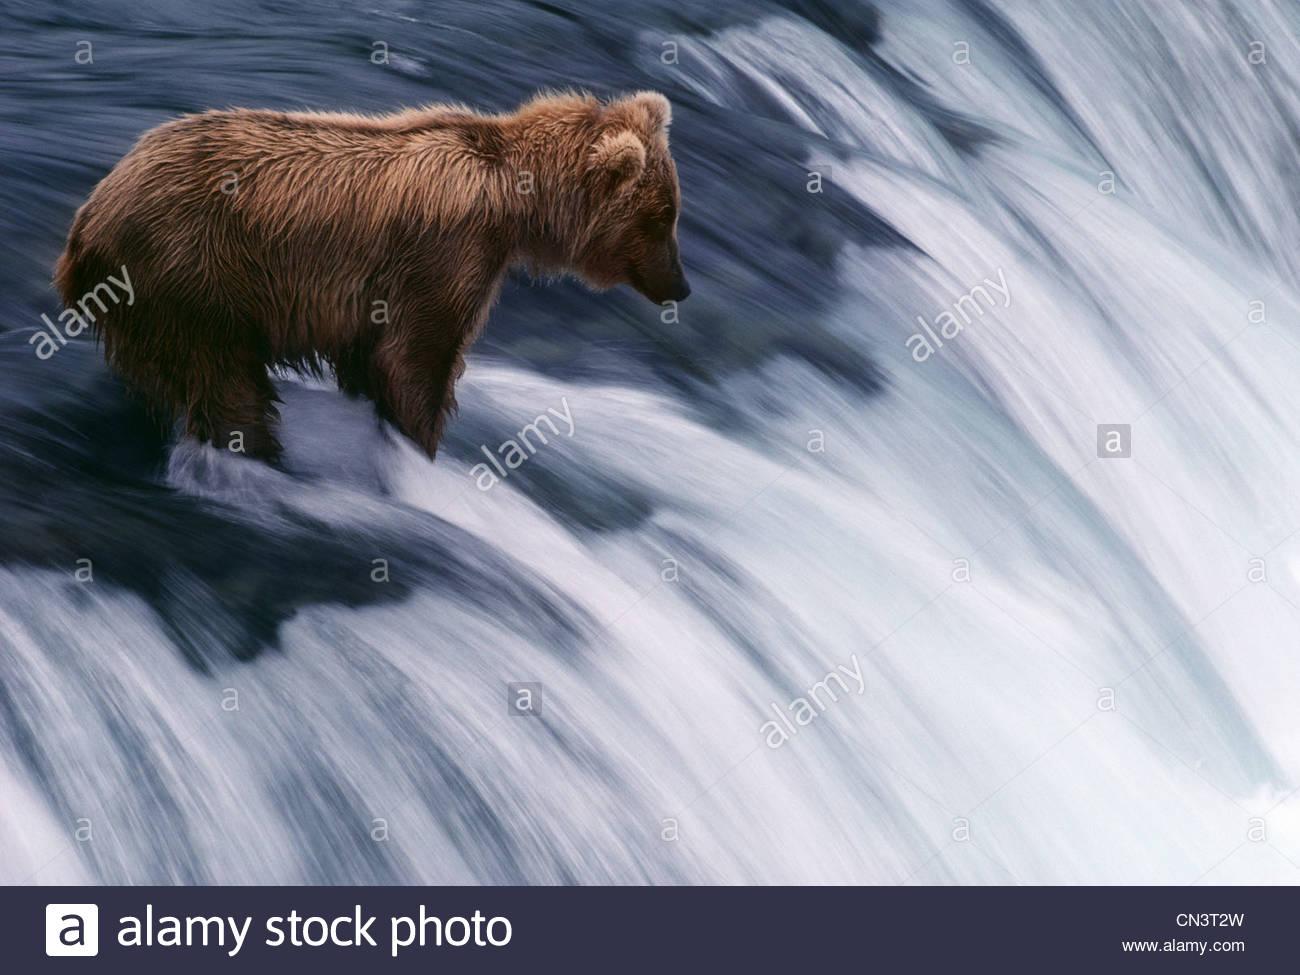 A bear hunts for salmon on Brooks Falls, Katmai National Park, Alaska - Stock Image